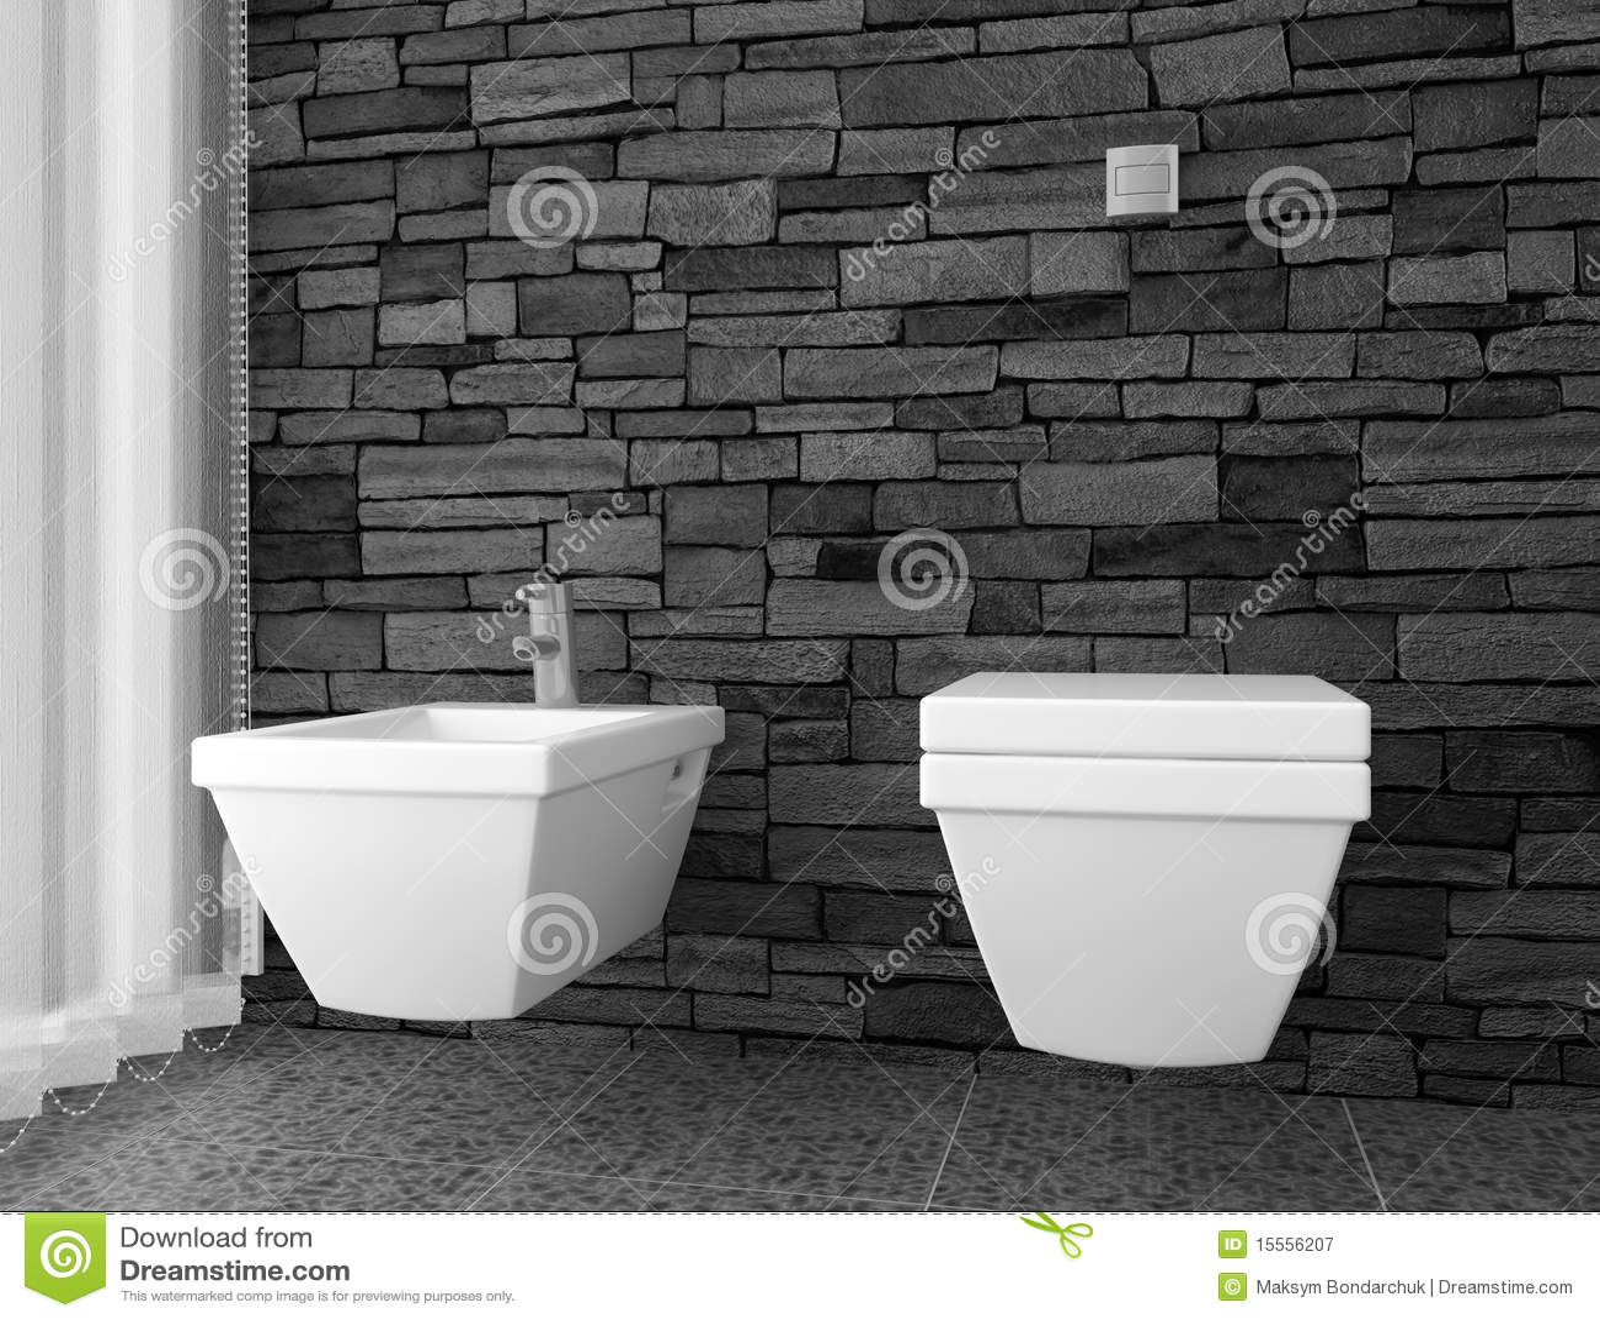 modern toilet with black stone wall stock illustration. Black Bedroom Furniture Sets. Home Design Ideas